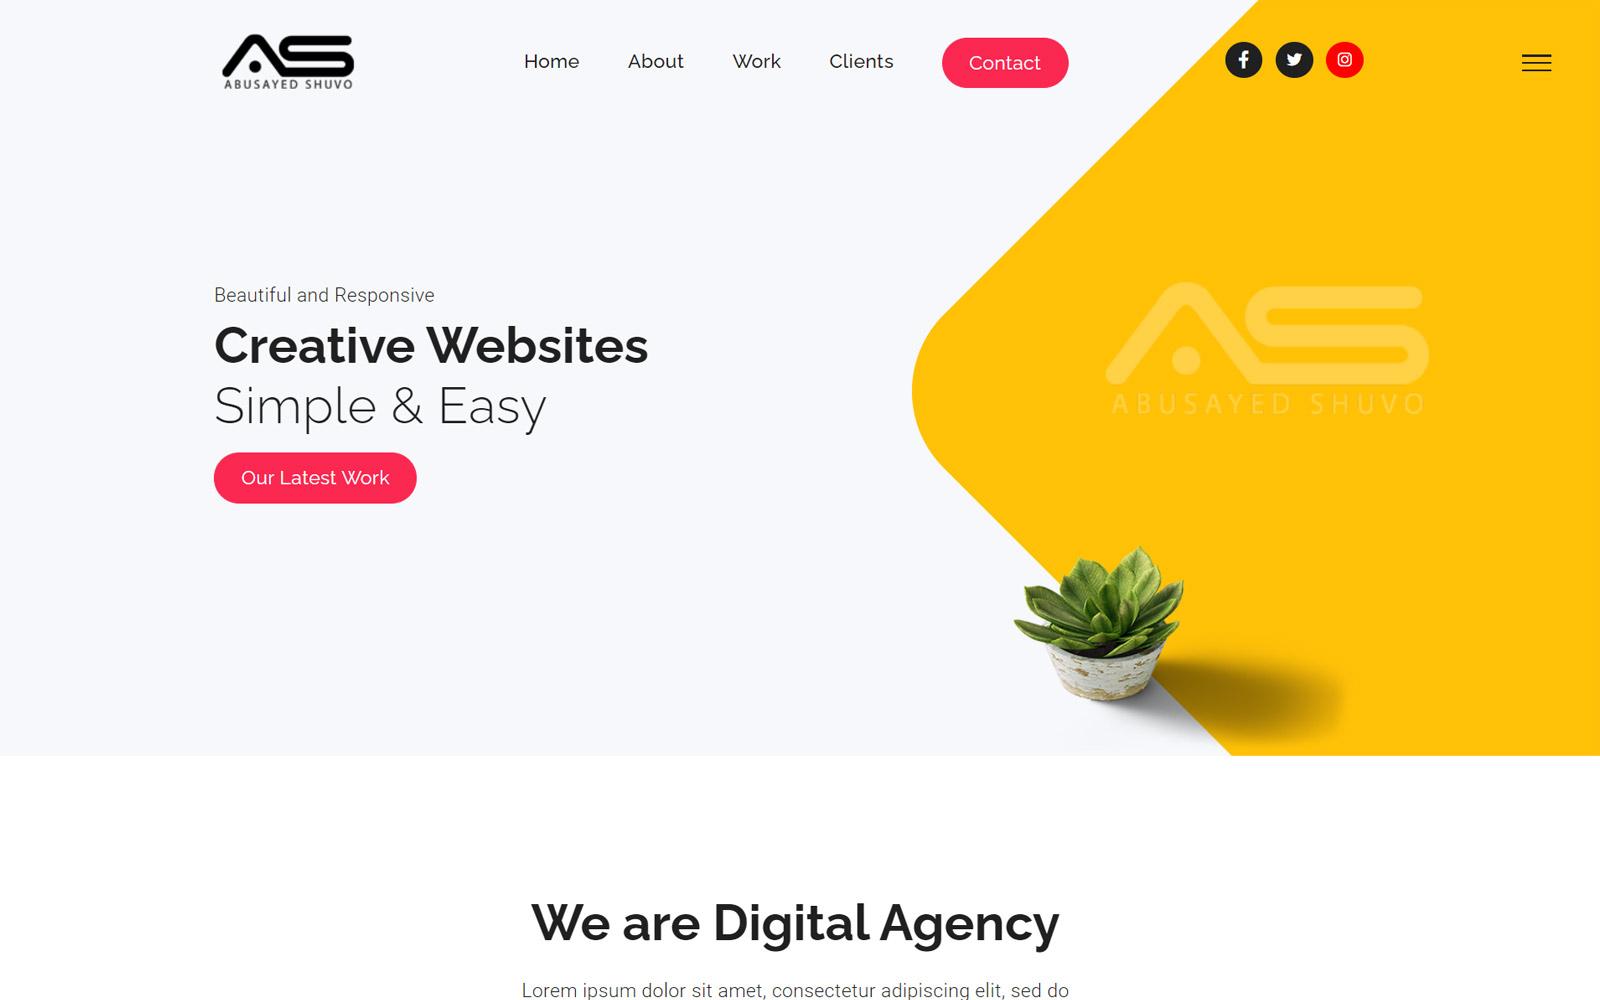 Abusayed | Digital Marketing HTML5 Landing Page Template